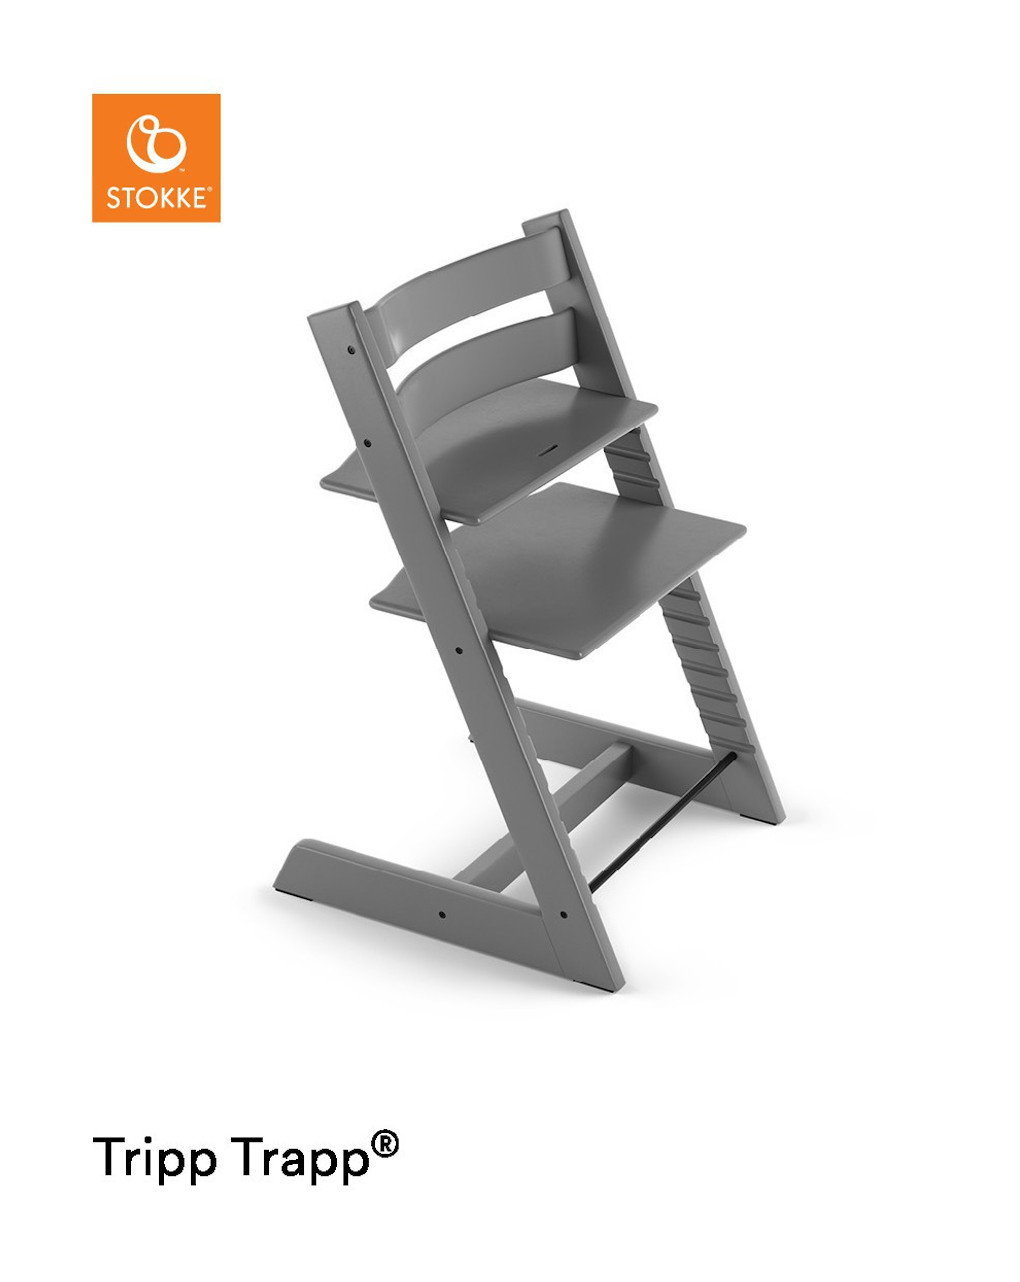 Tripp trapp® - cinza tempestade - Stokke